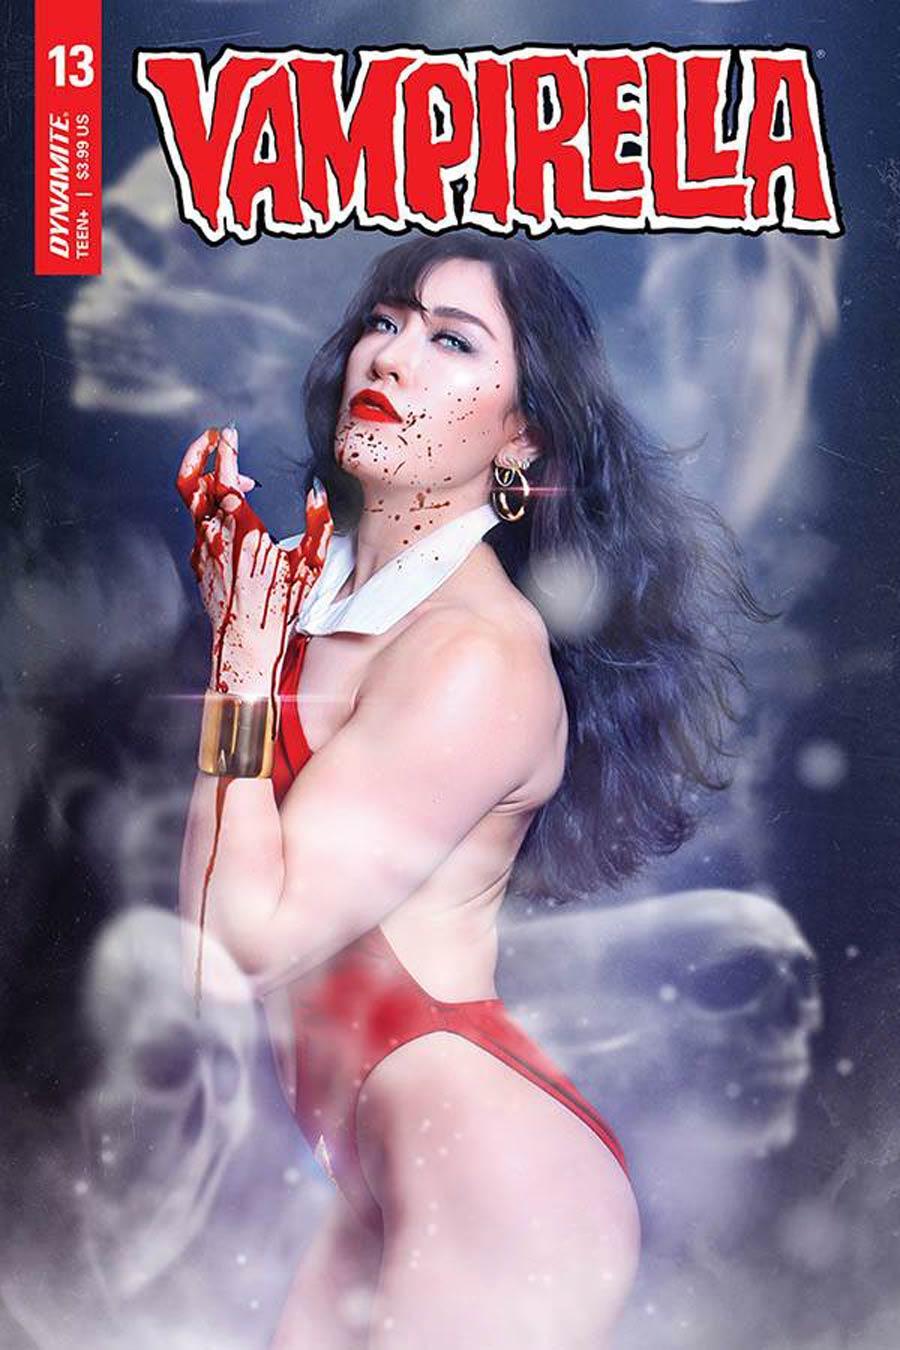 Vampirella Vol 8 #13 Cover E Variant Krista Lee Cosplay Photo Cover